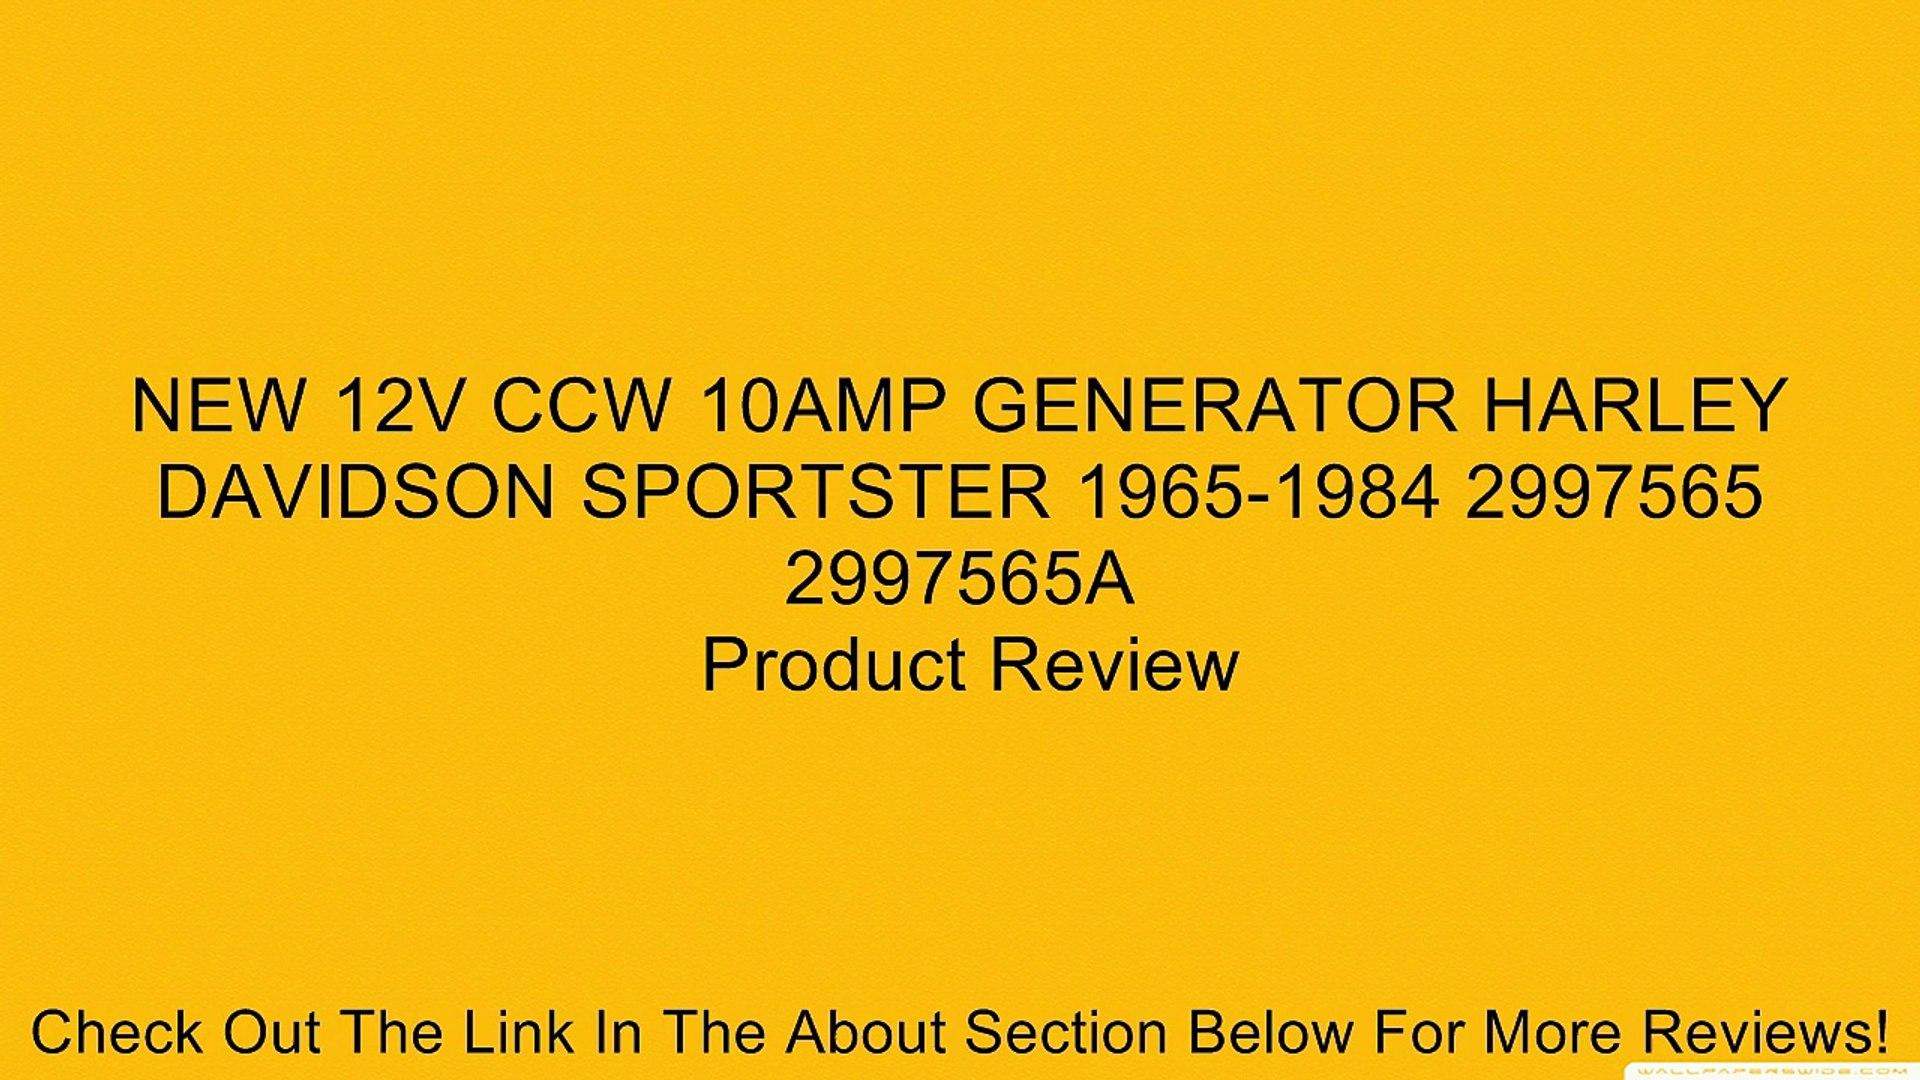 NEW 12V CCW 10AMP GENERATOR HARLEY DAVIDSON SPORTSTER 1965-1984 2997565 2997565A